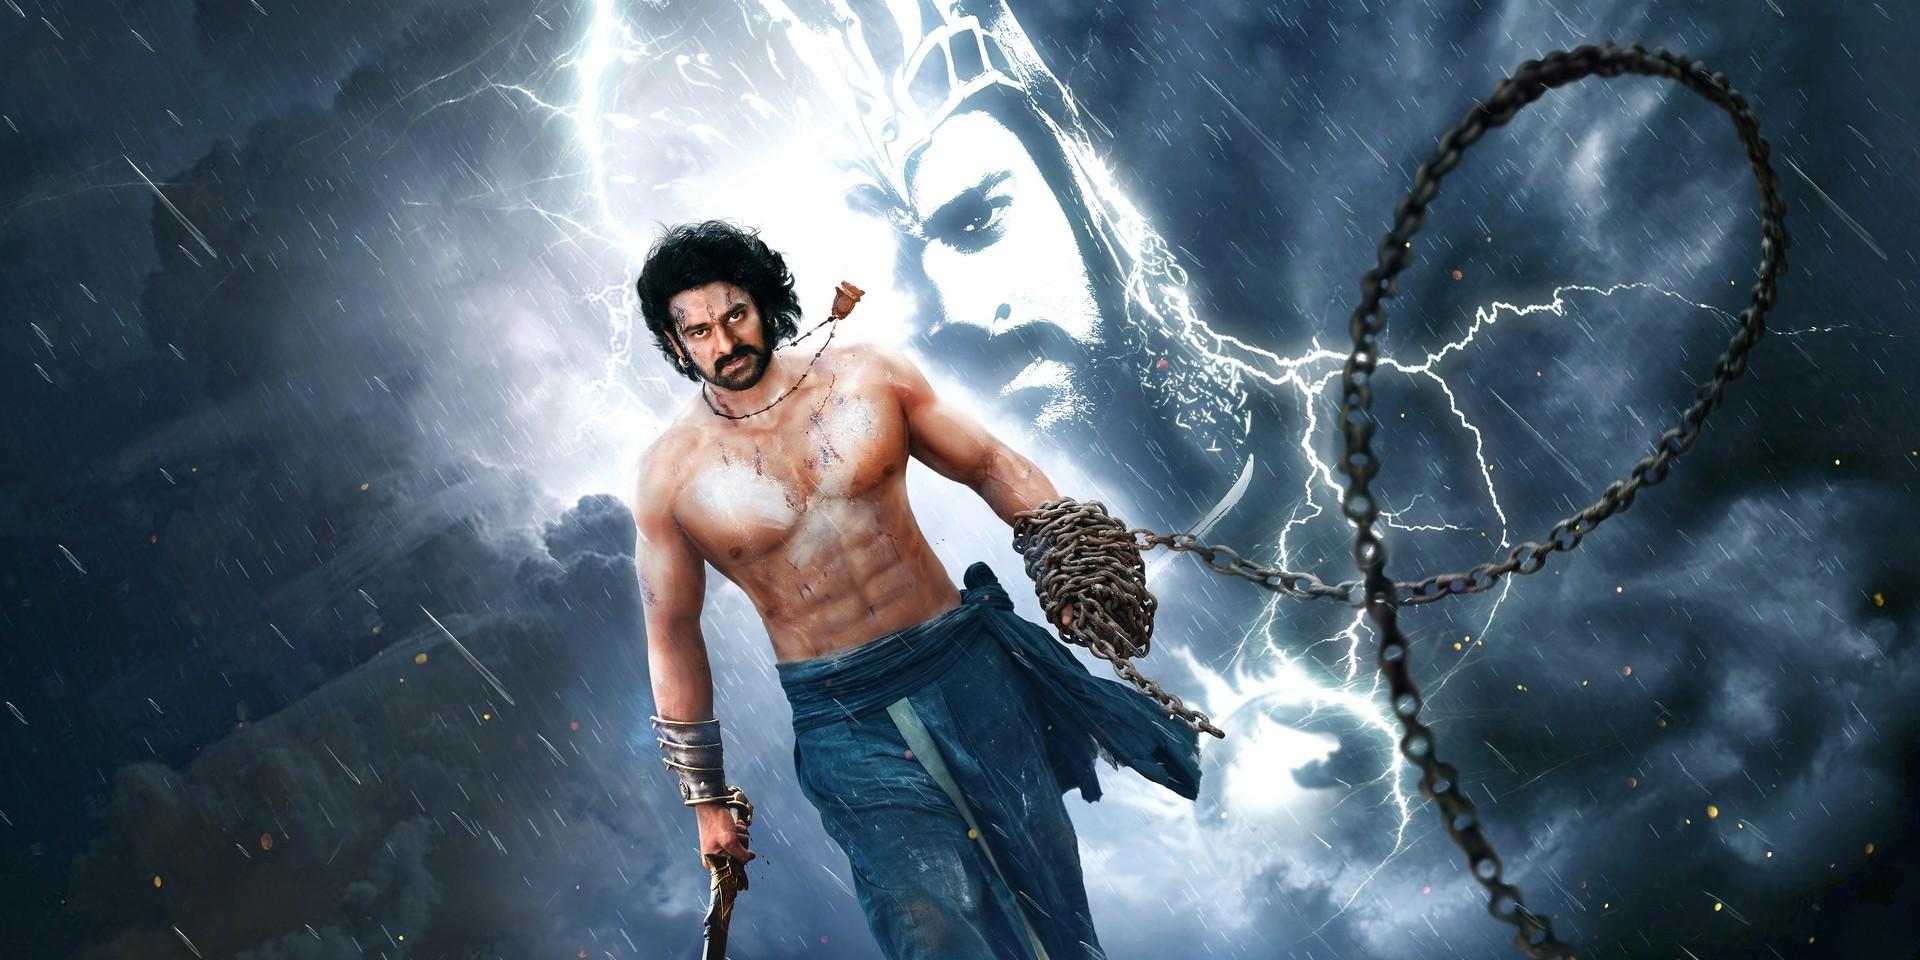 bahubali 2 torrent download